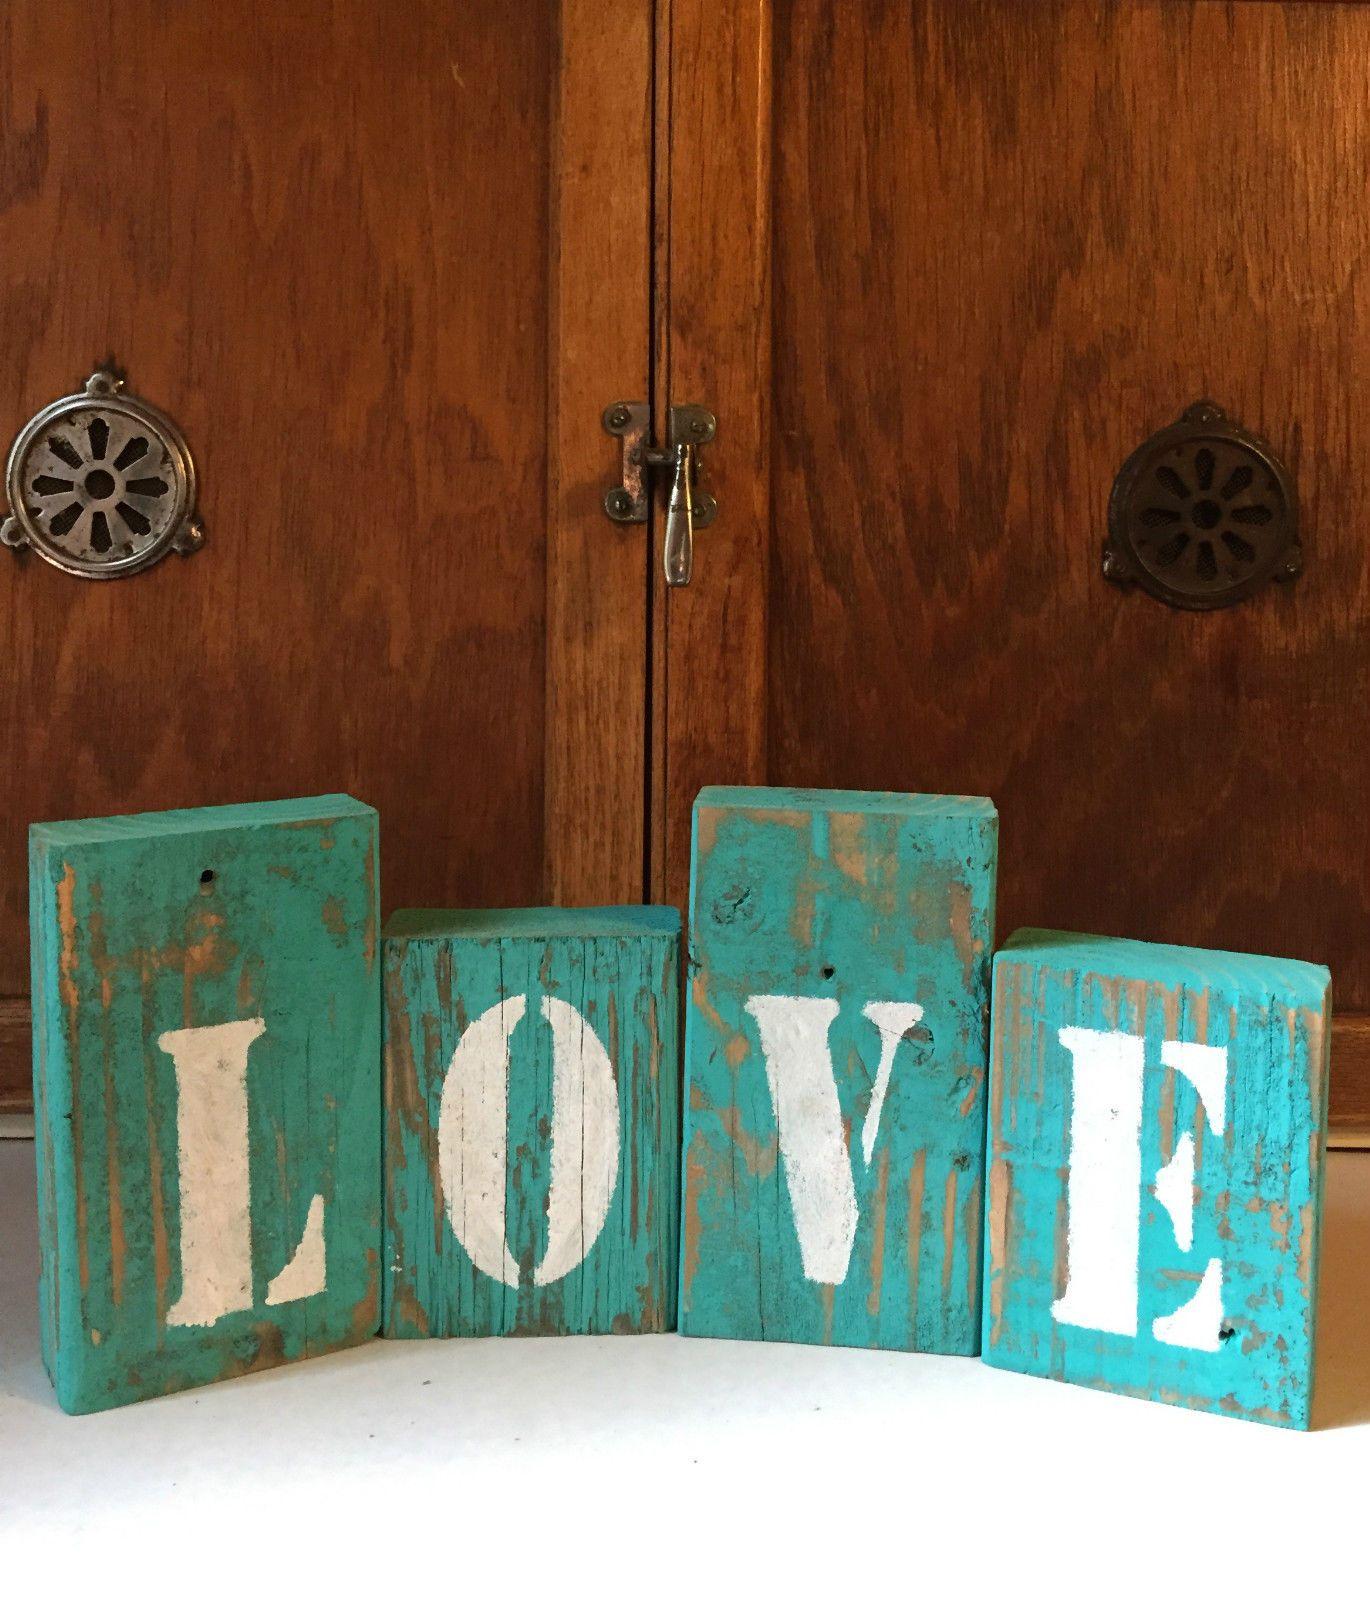 Love Sign Teal Blocks Rustic Wood Decor Shelf Sitter Country Decor